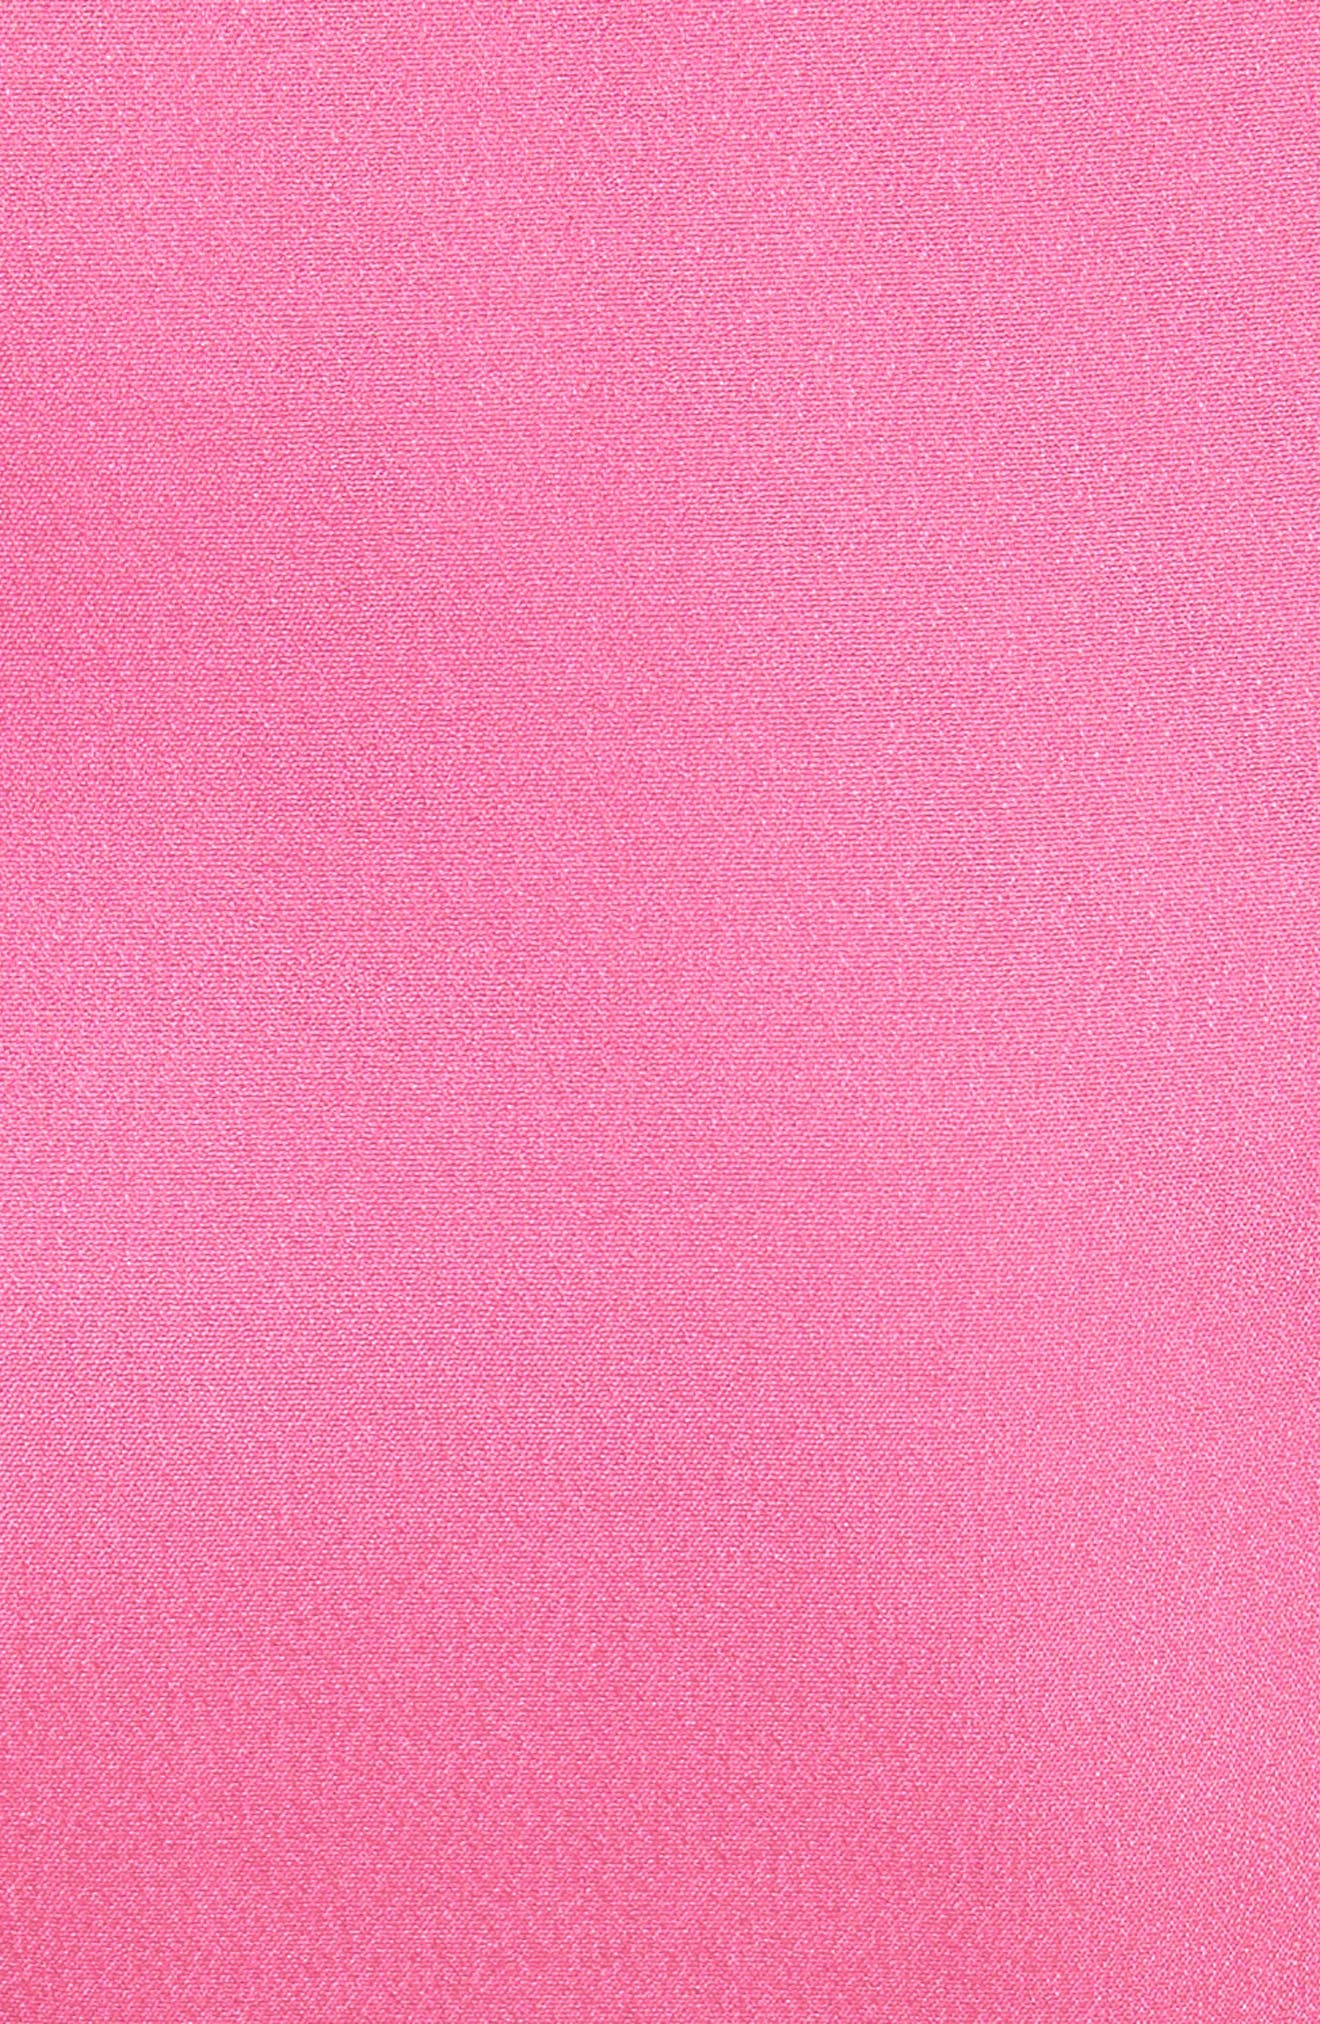 Silk Blend Sheath Dress,                             Alternate thumbnail 6, color,                             Carnation